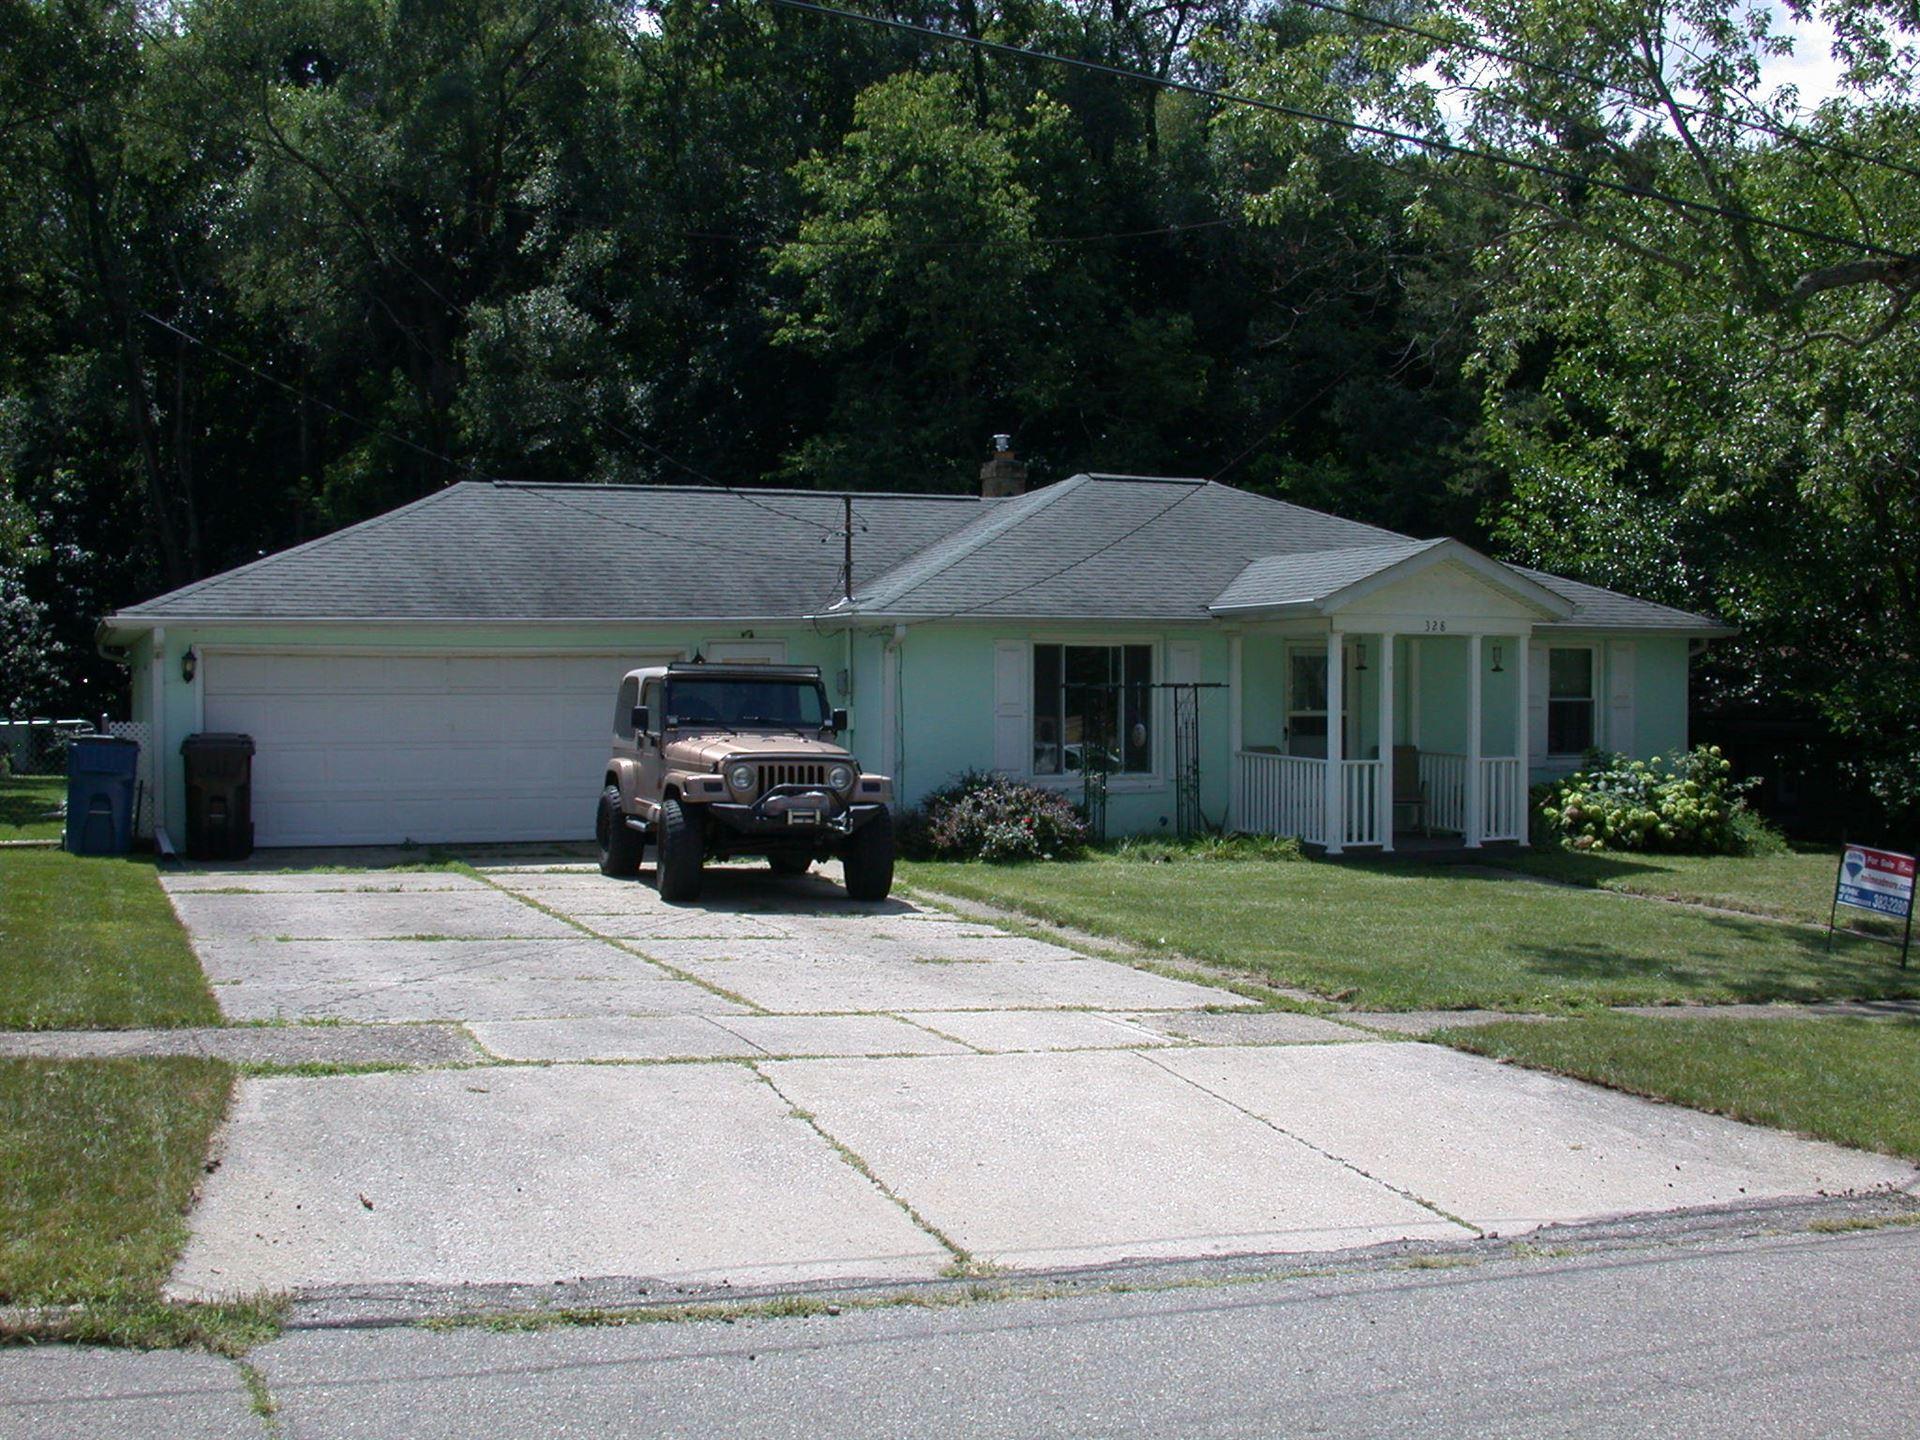 328 E Glenguile Avenue, Parchment, MI 49004 - MLS#: 21098426